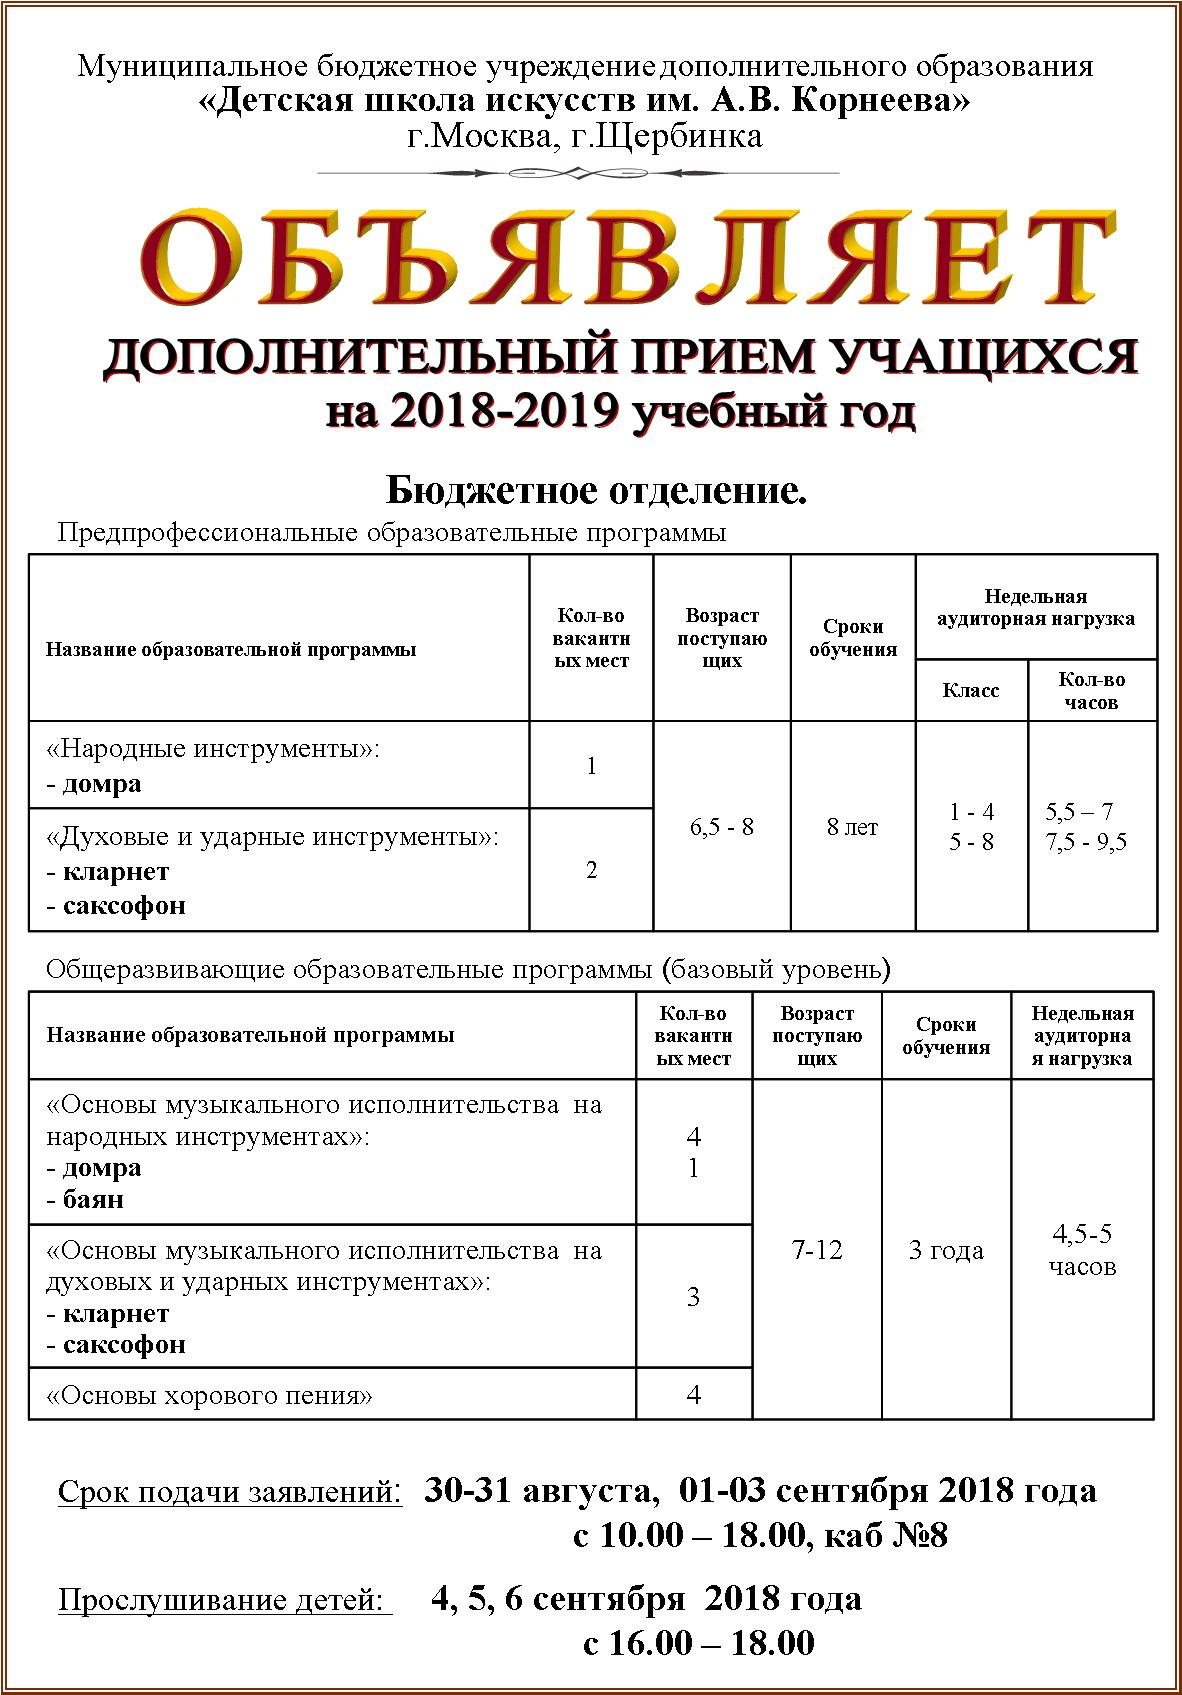 ДШИ Доп.набор 2018